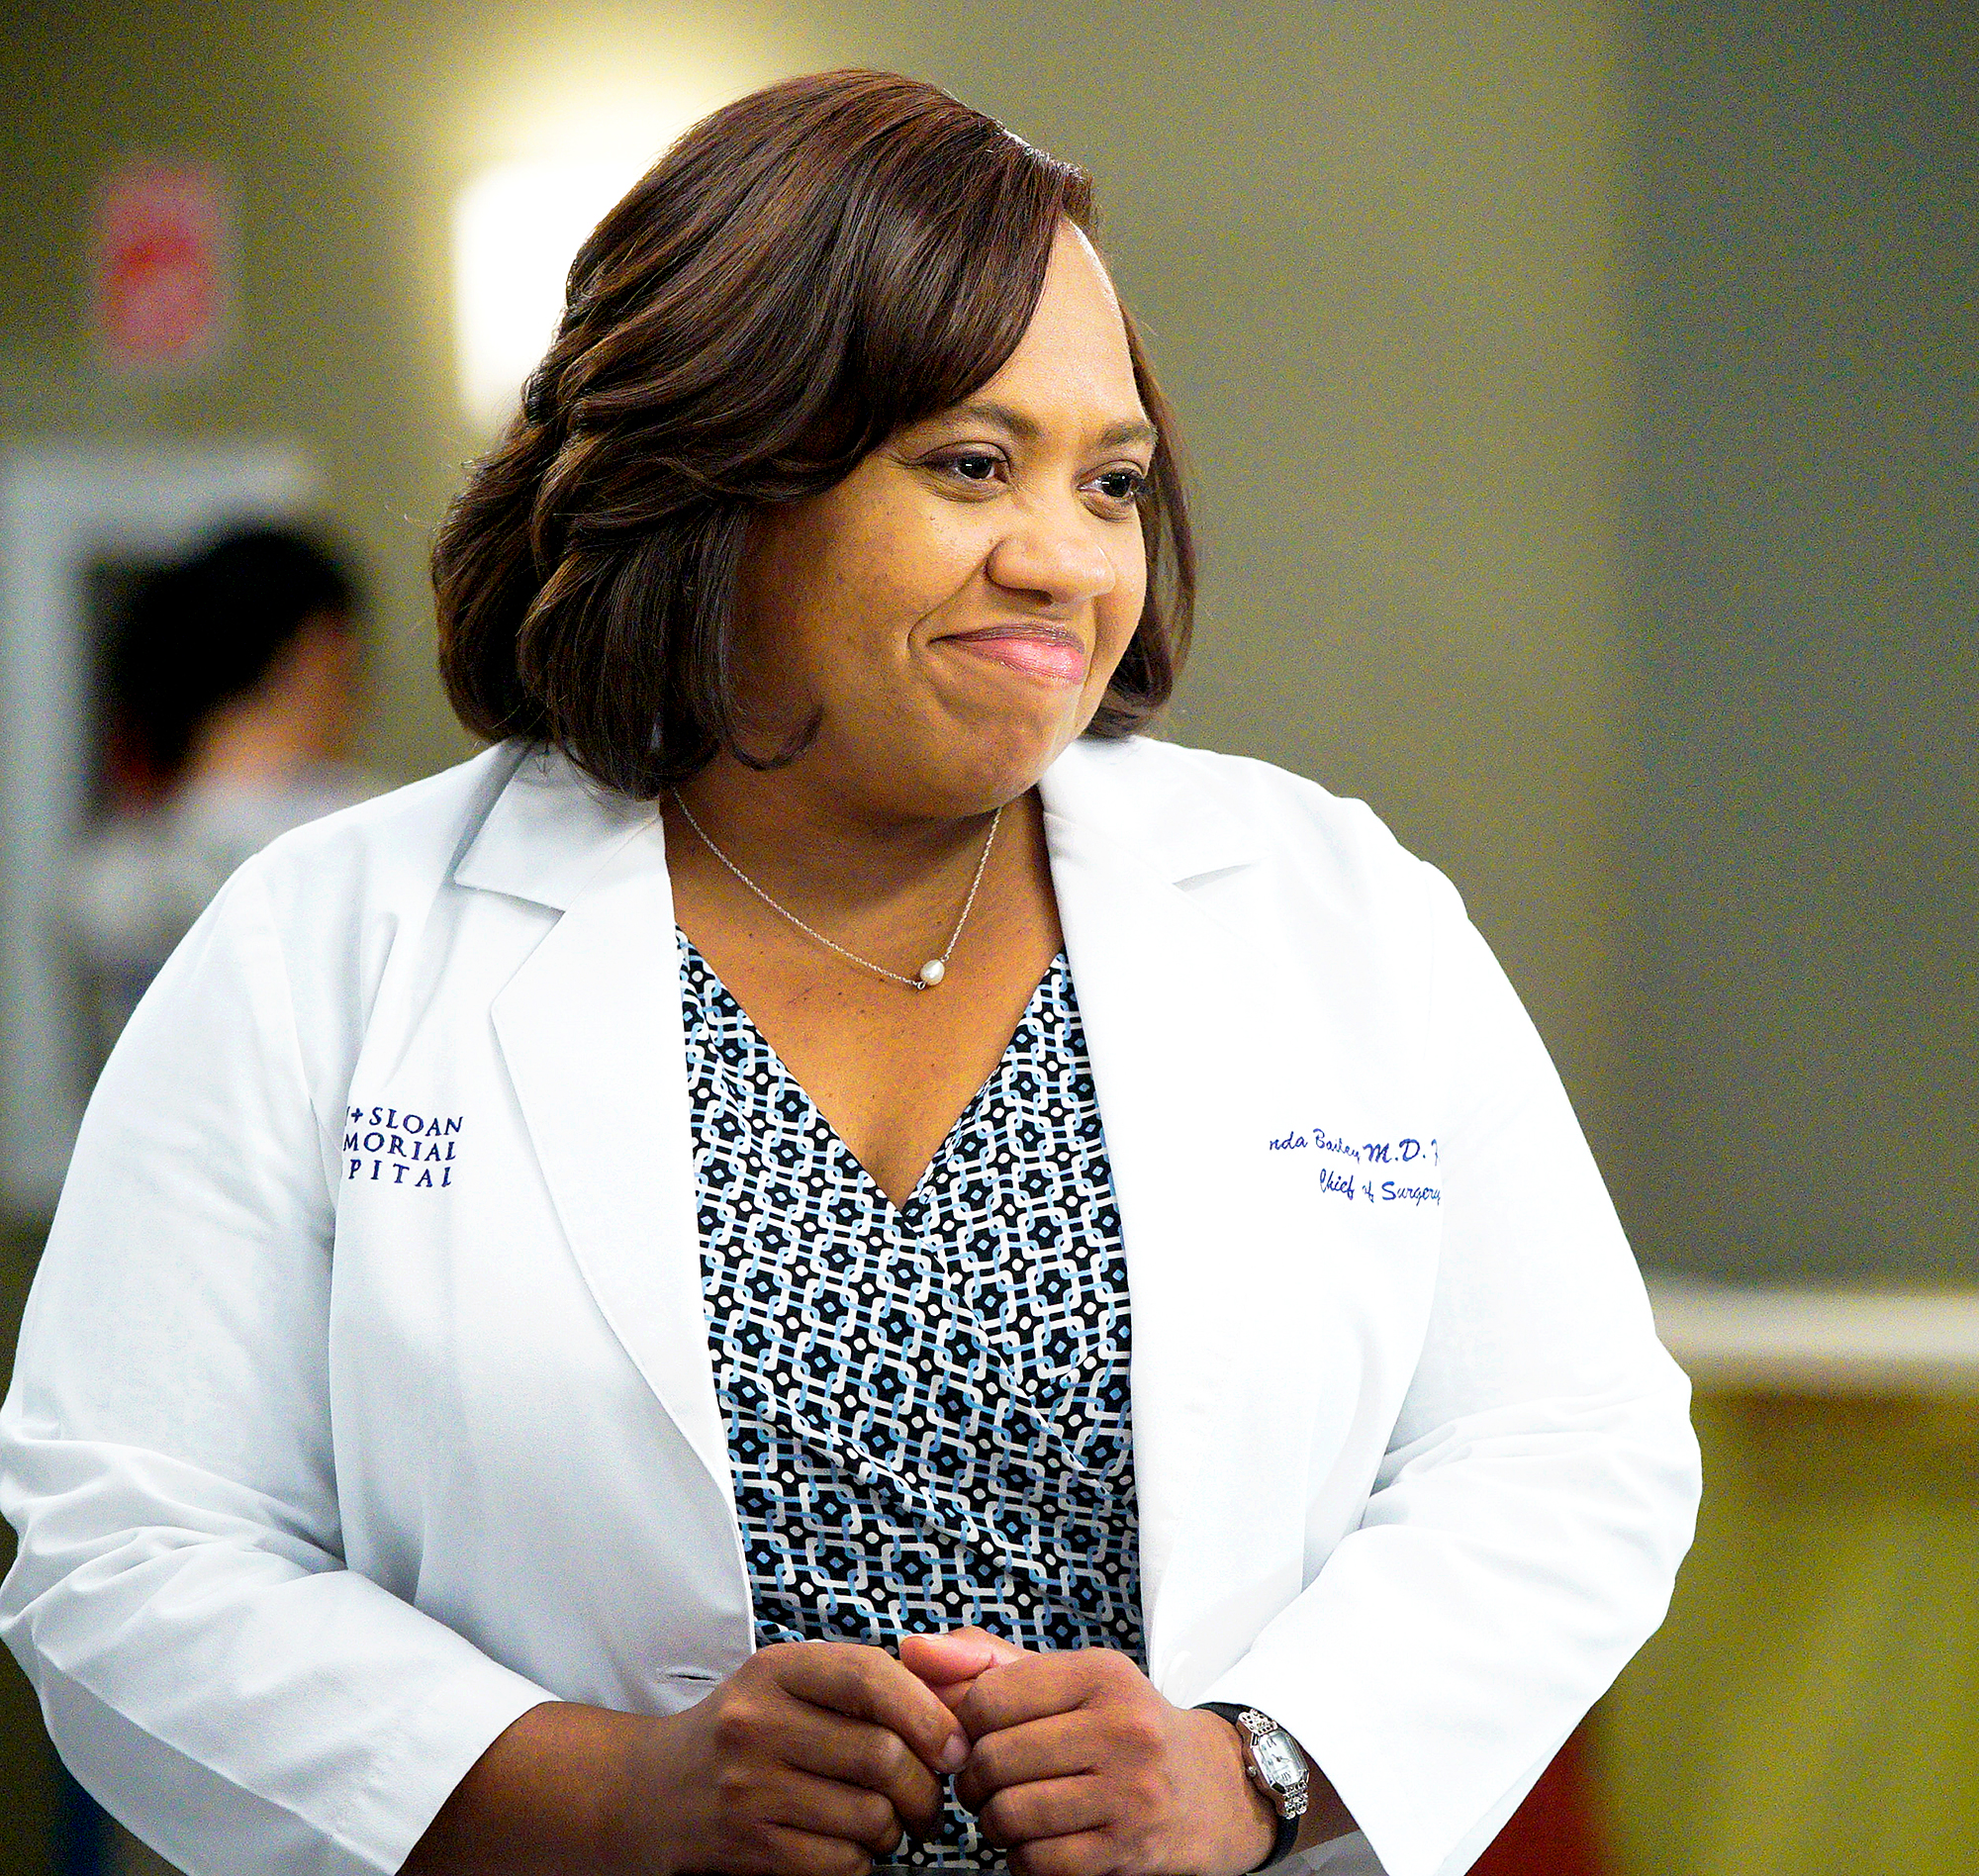 Chandra Wilson as Dr. Miranda Bailey on 'Grey's Anatomy'